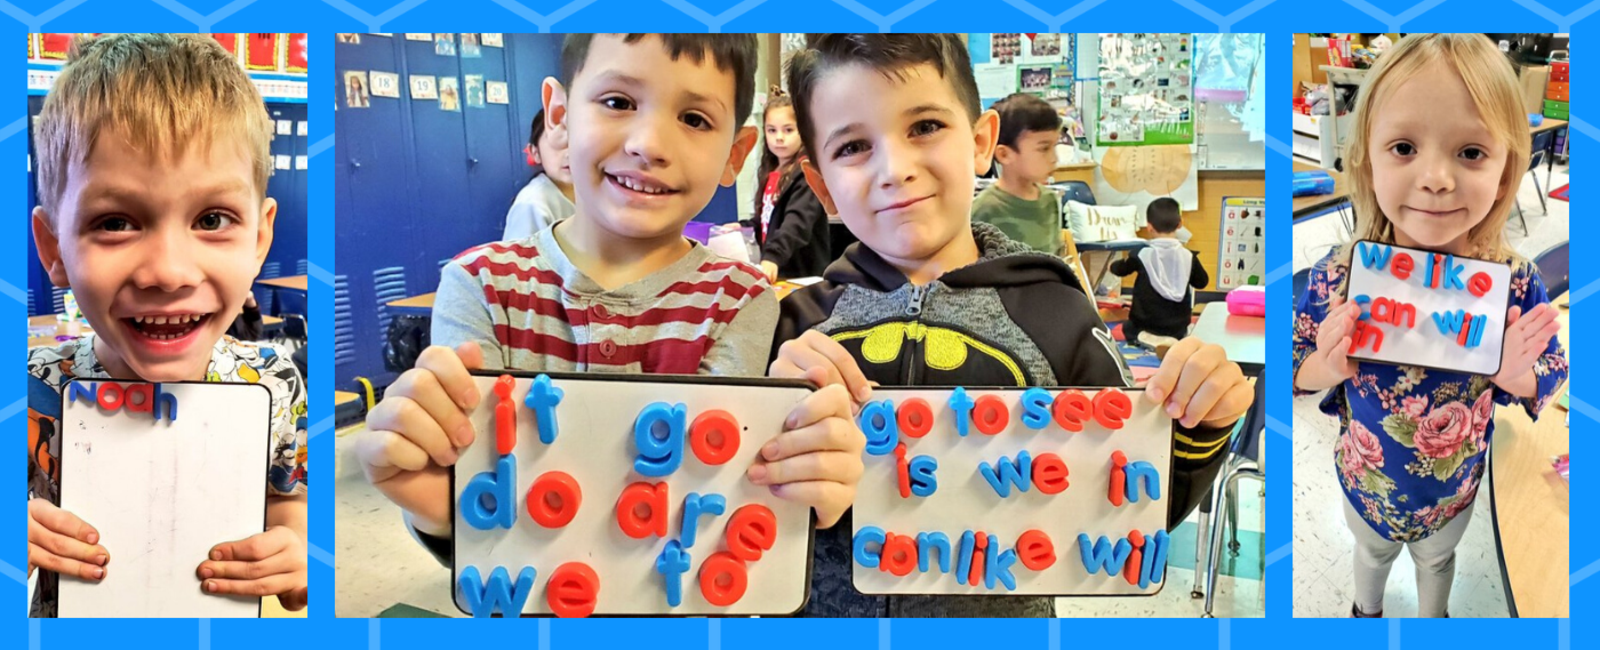 kindergarten students working on sight words